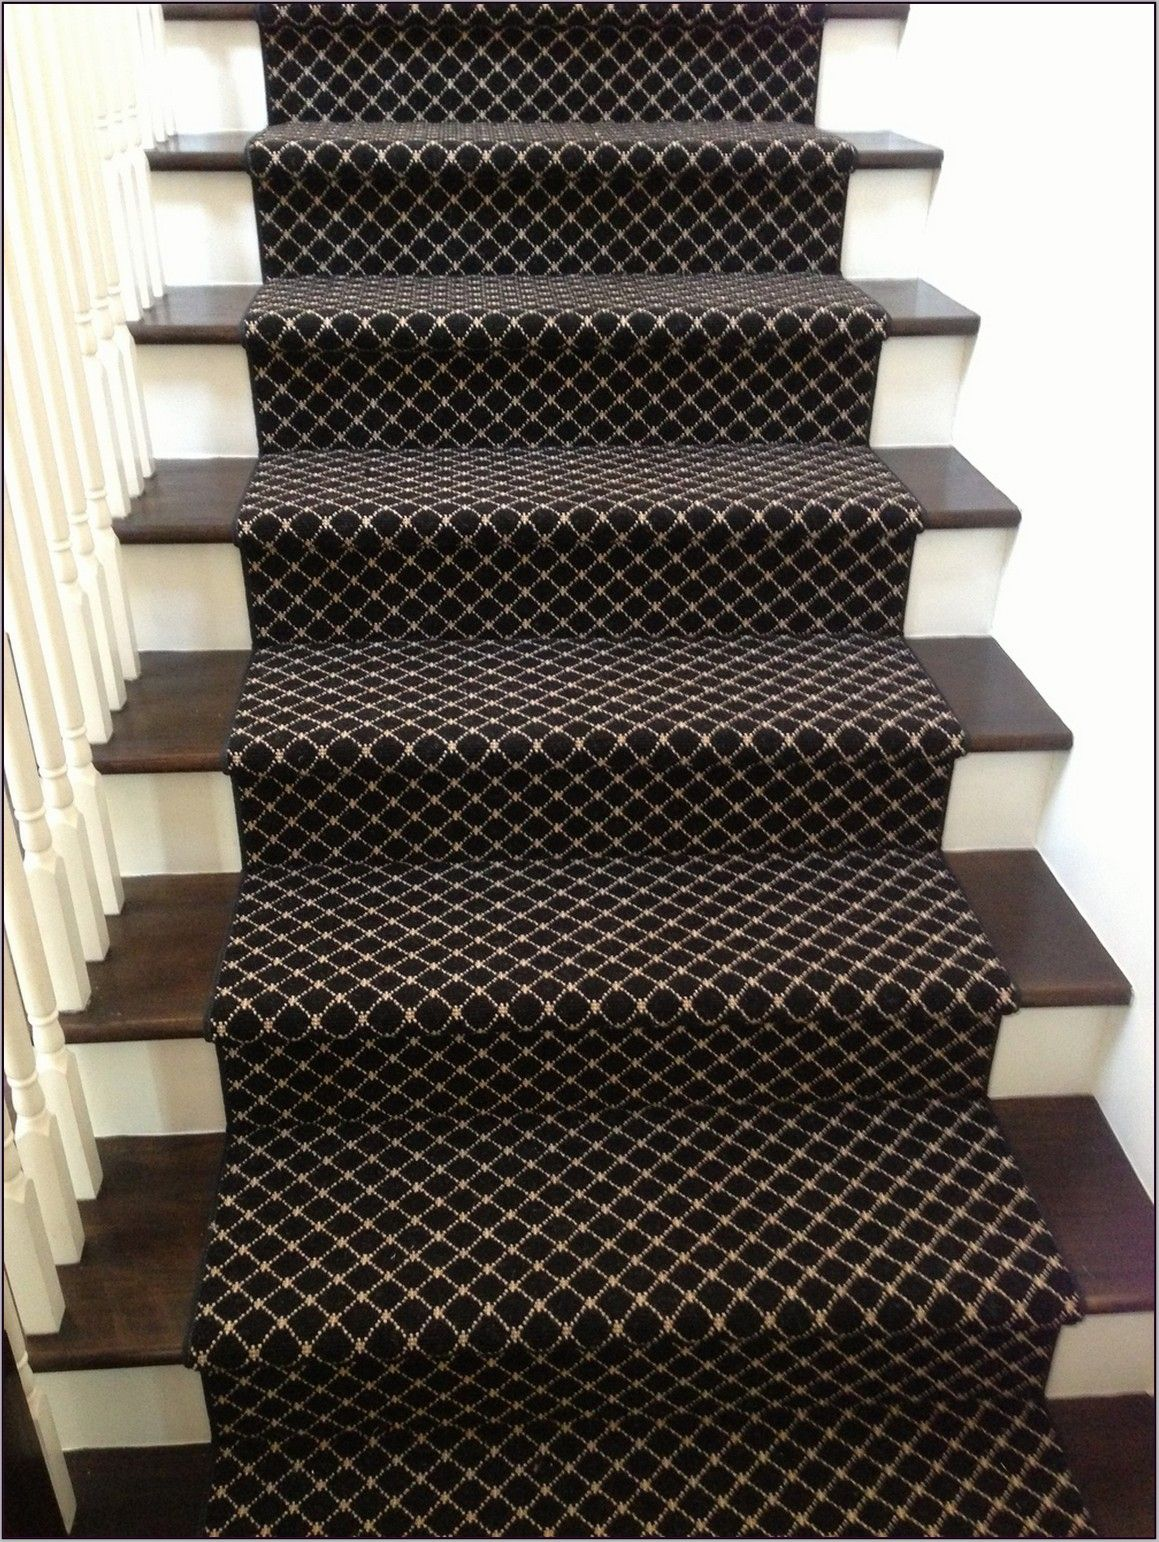 Modern Carpet Runners For Stairs For Modern Home Design Ekahomes Com Stair Runner Carpet Carpet Stairs Patterned Carpet